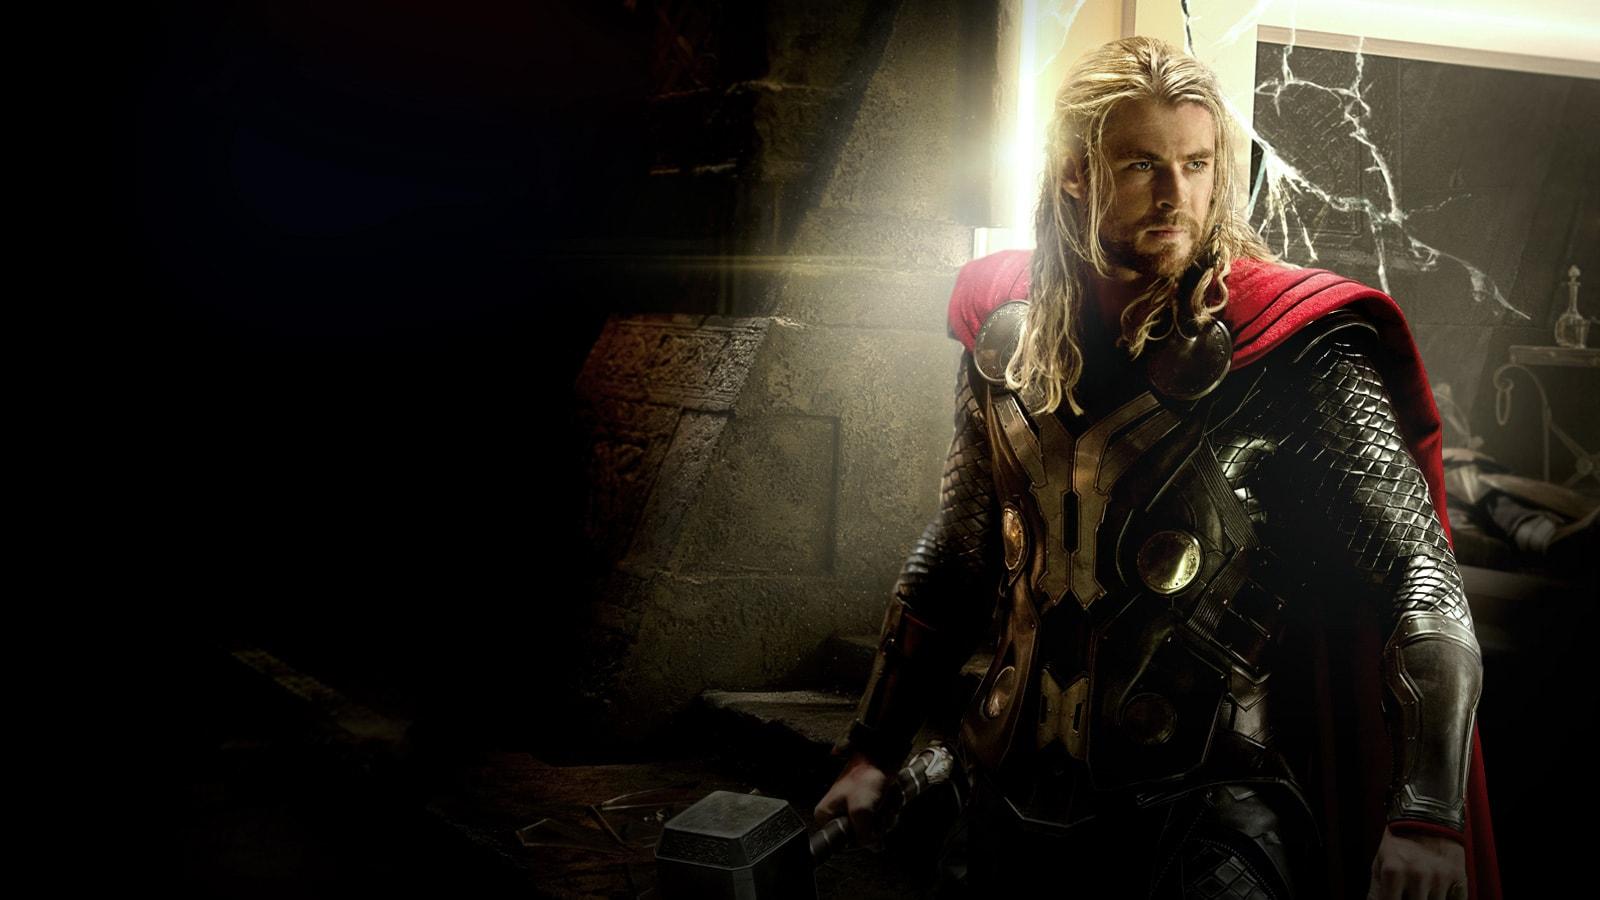 Thor: Ragnarok Backgrounds